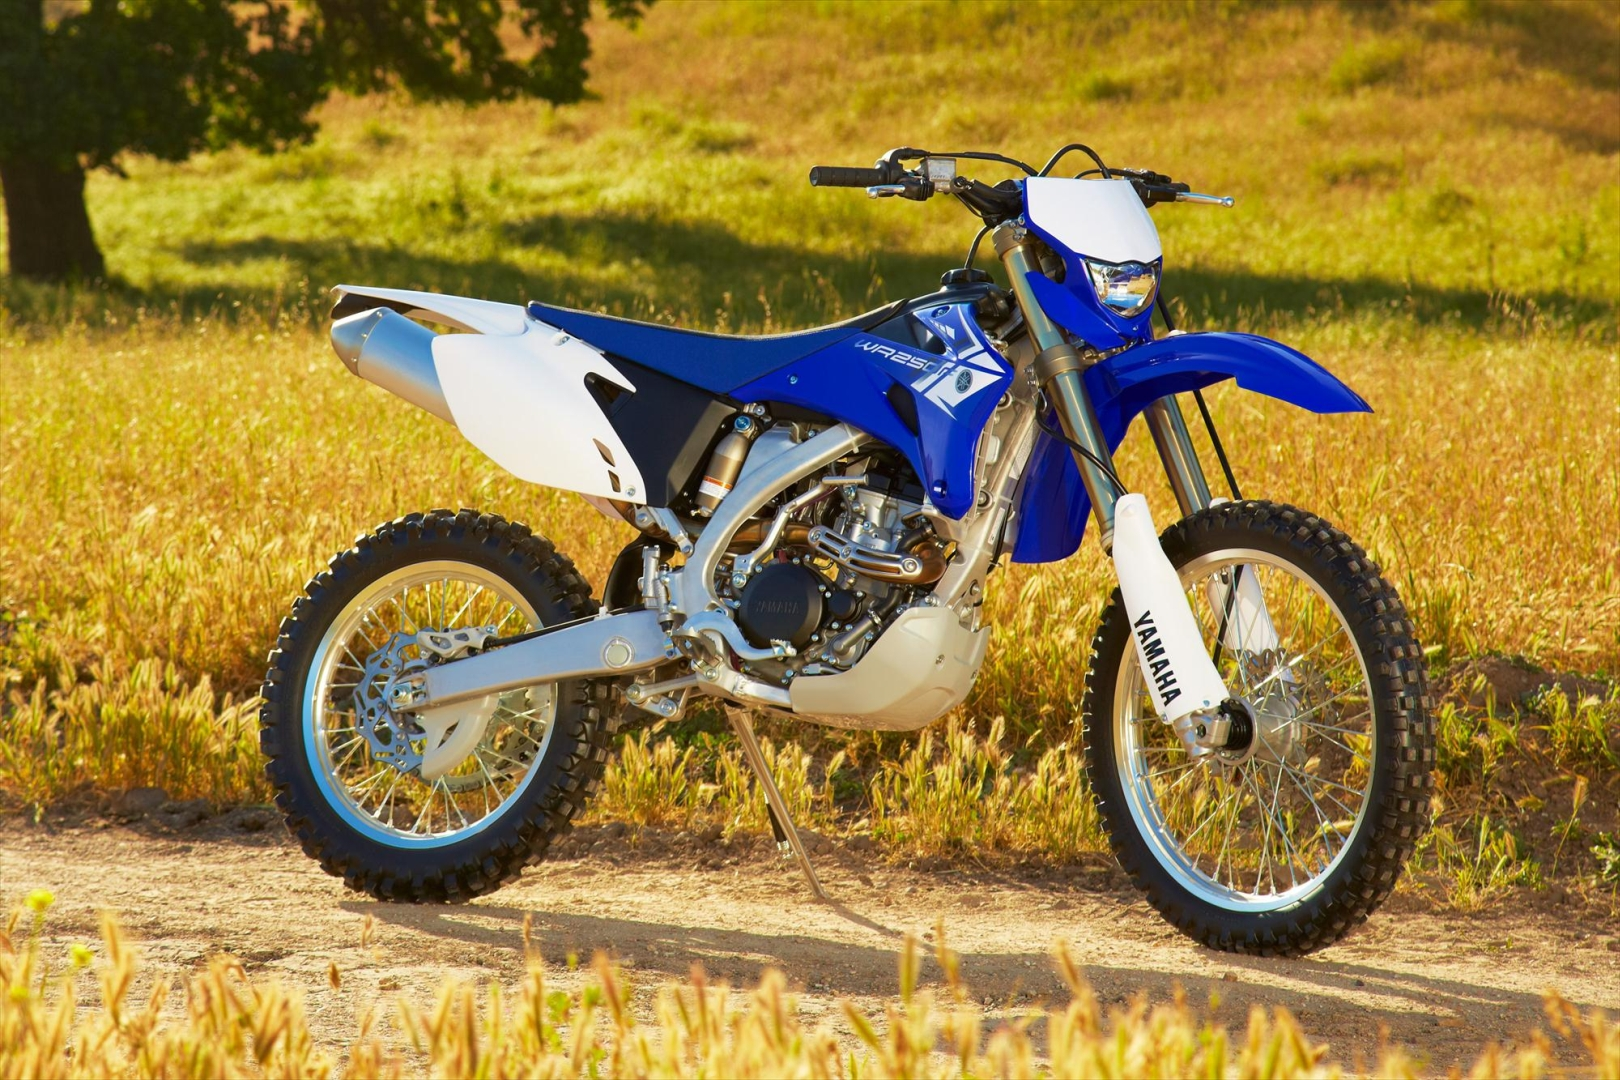 2013 Yamaha Wr250f The Fun Off Road Bike With Racing Attitude